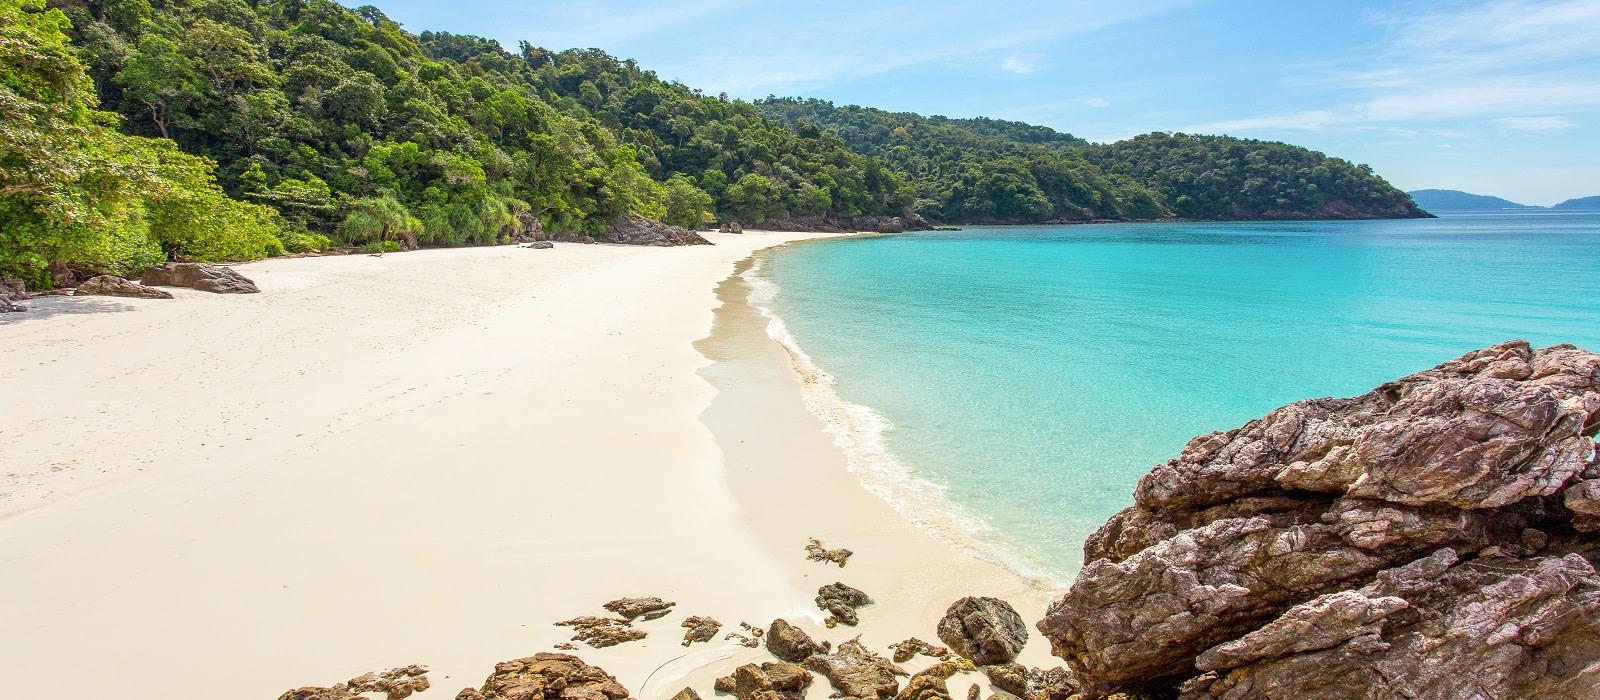 Reiseziel Southern Mergui Archipelago Myanmar